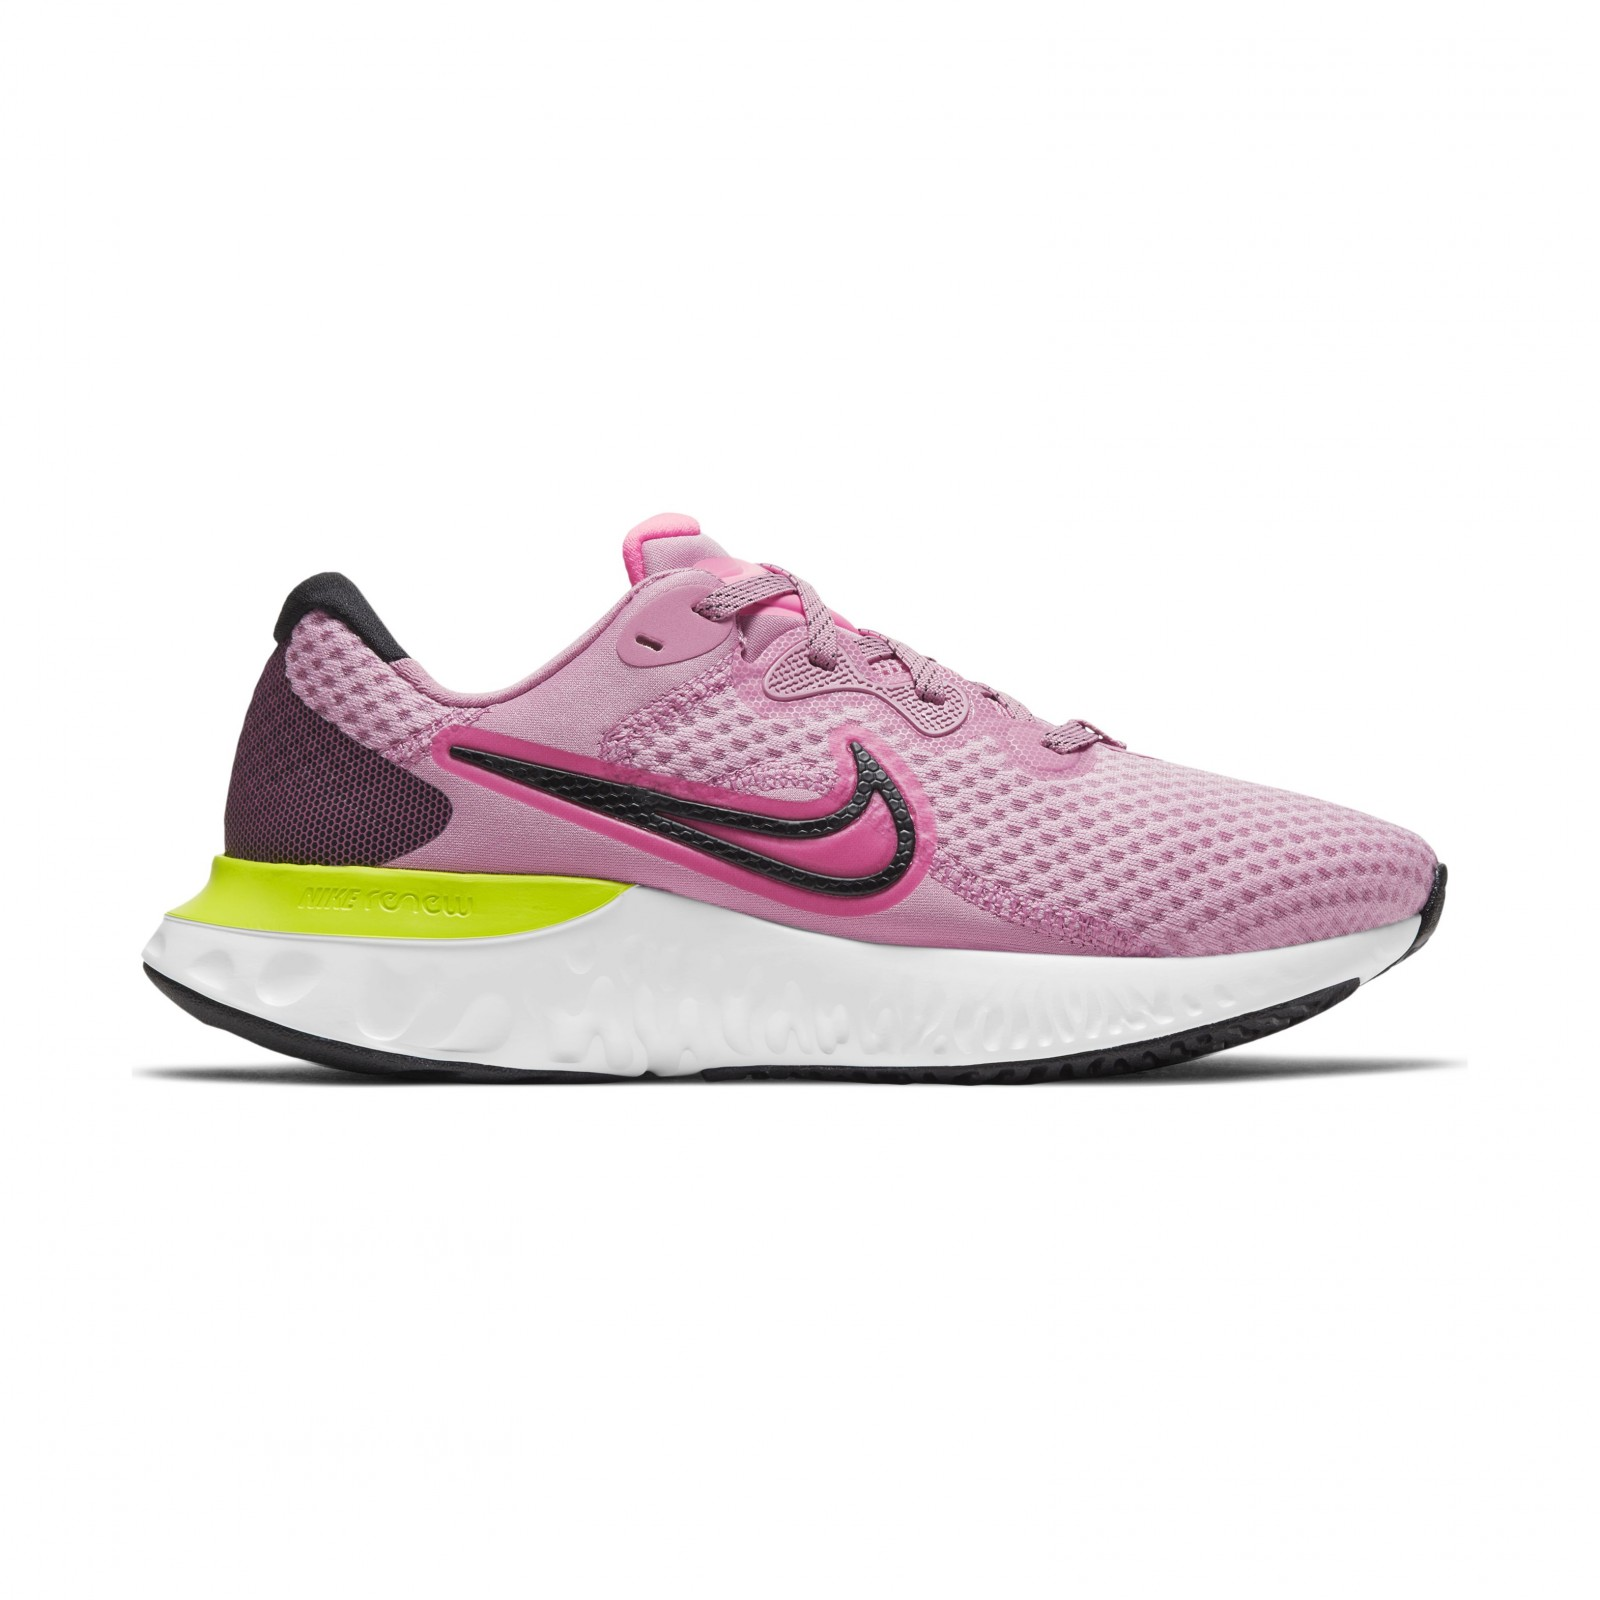 Nike Renew Run 2 ELEMENTAL PINK/SUNSET PULSE-BLACK-CYBER